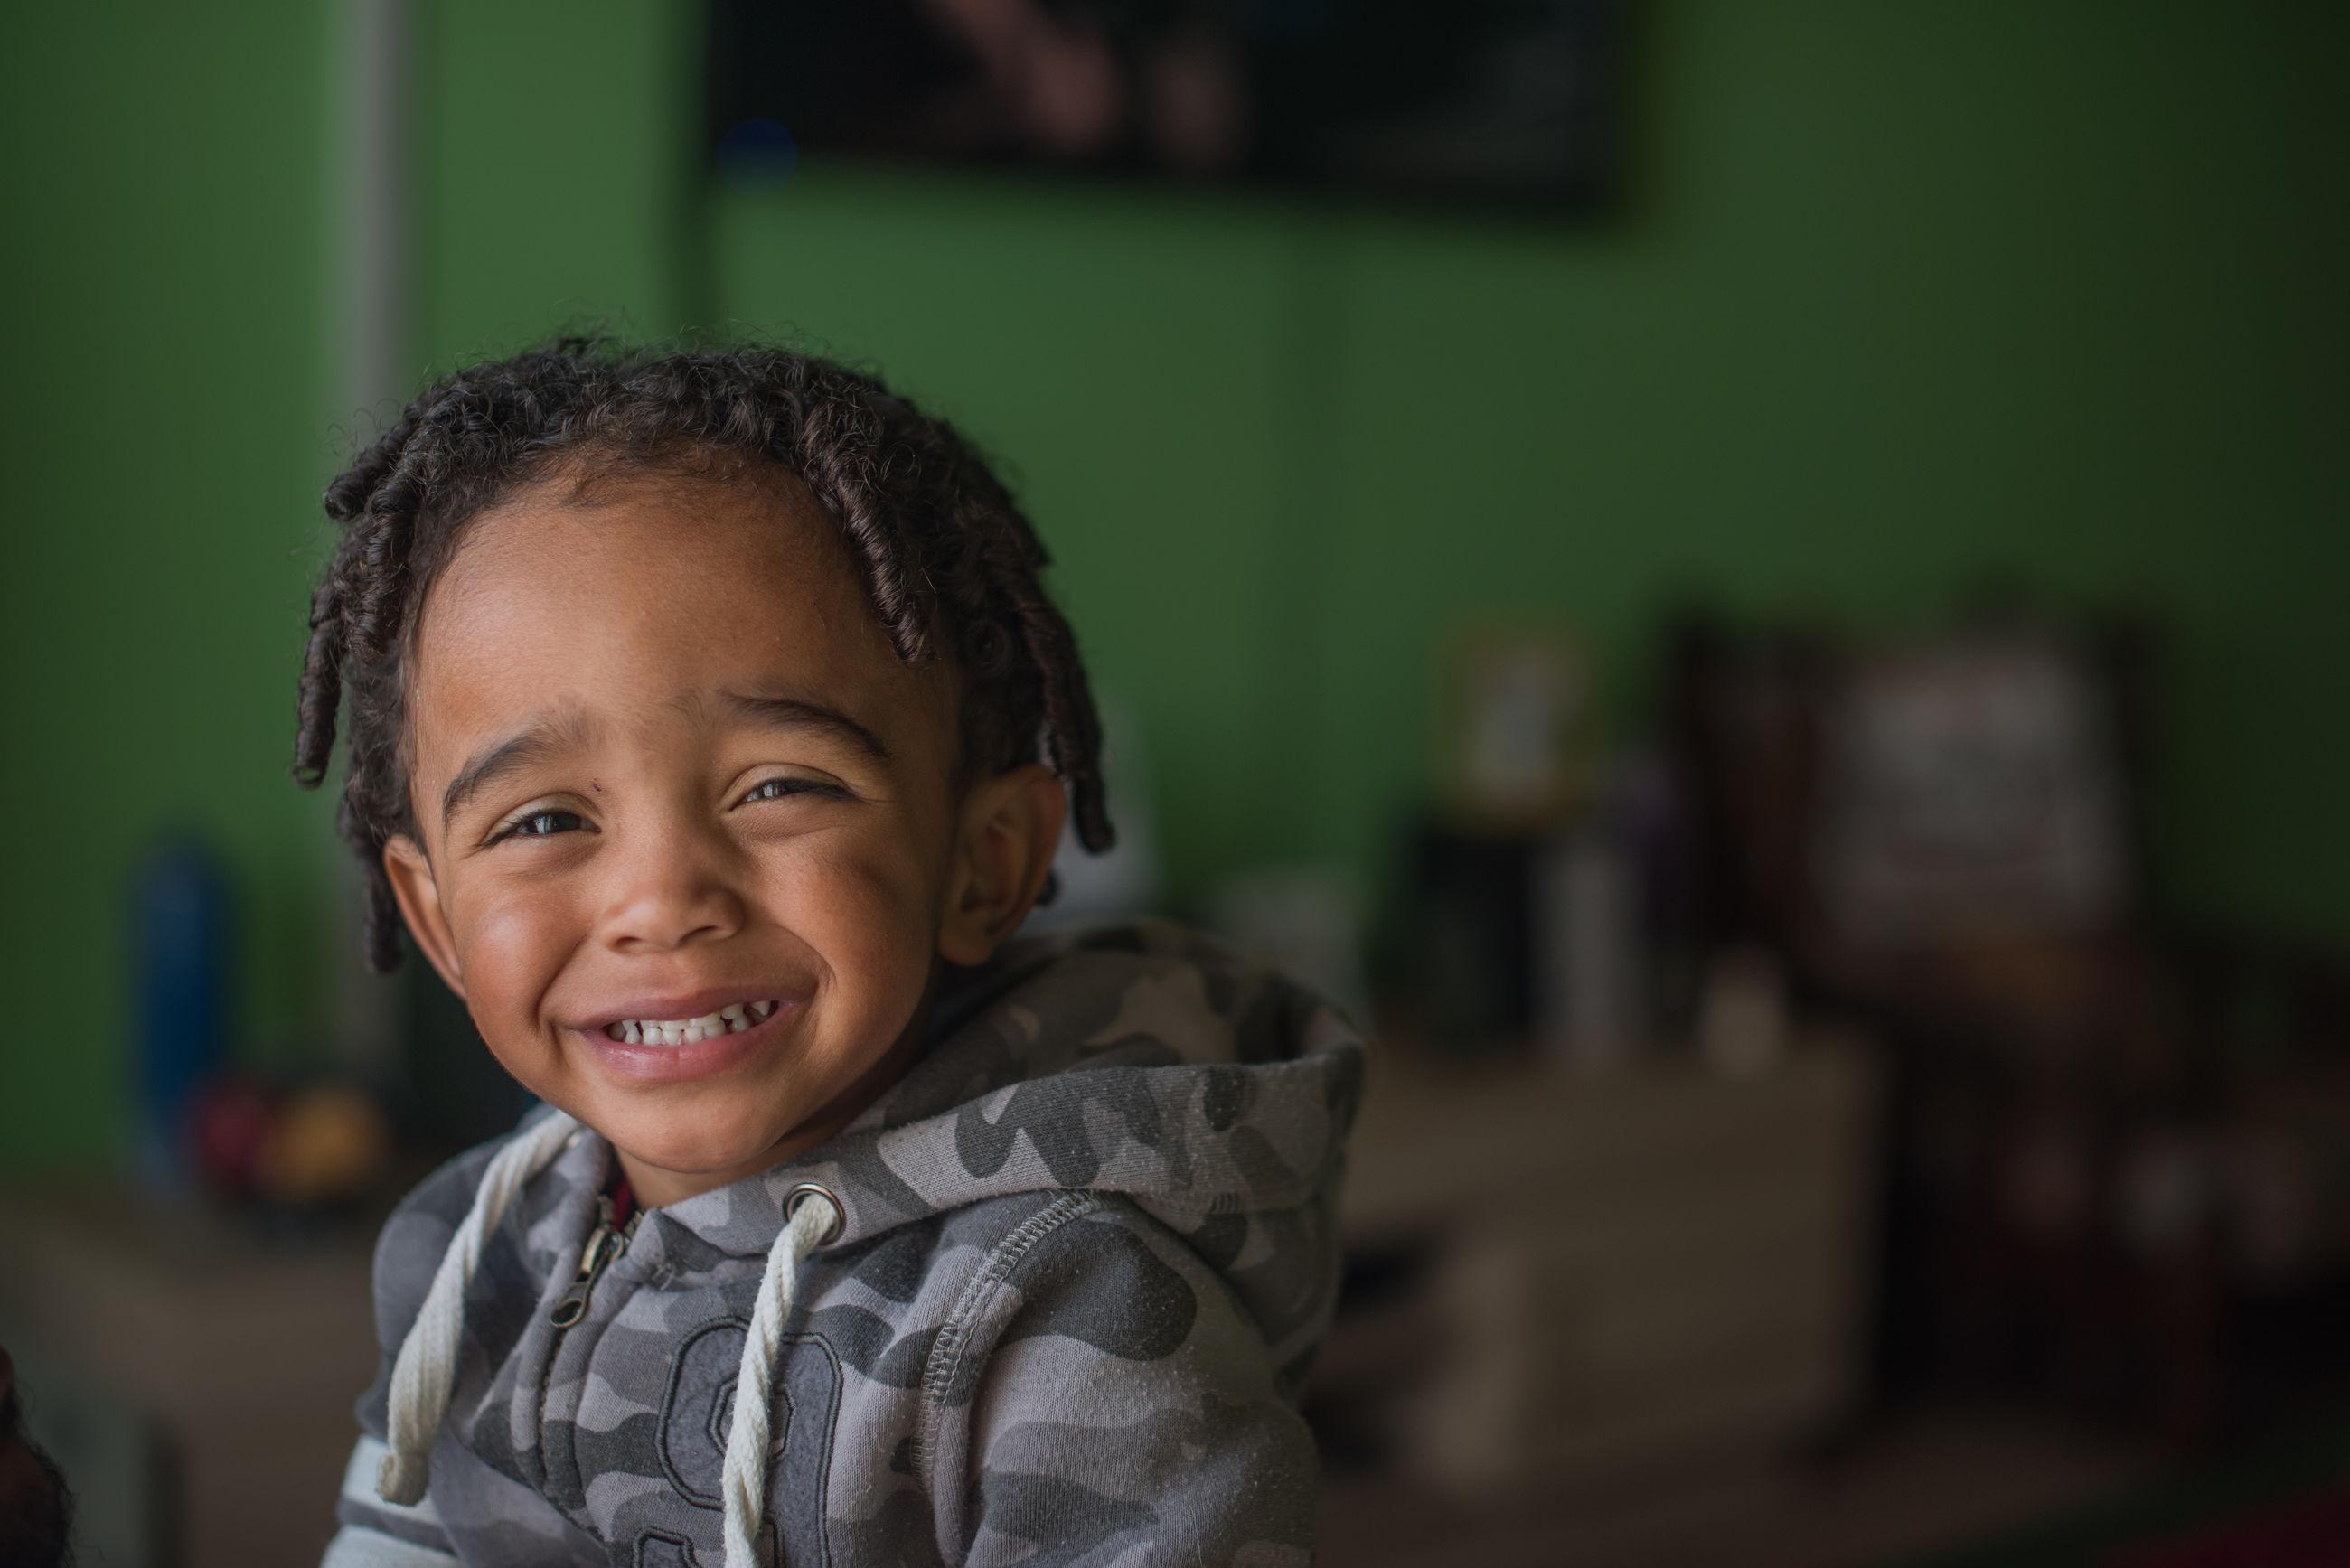 Portrait of cute boy smiling